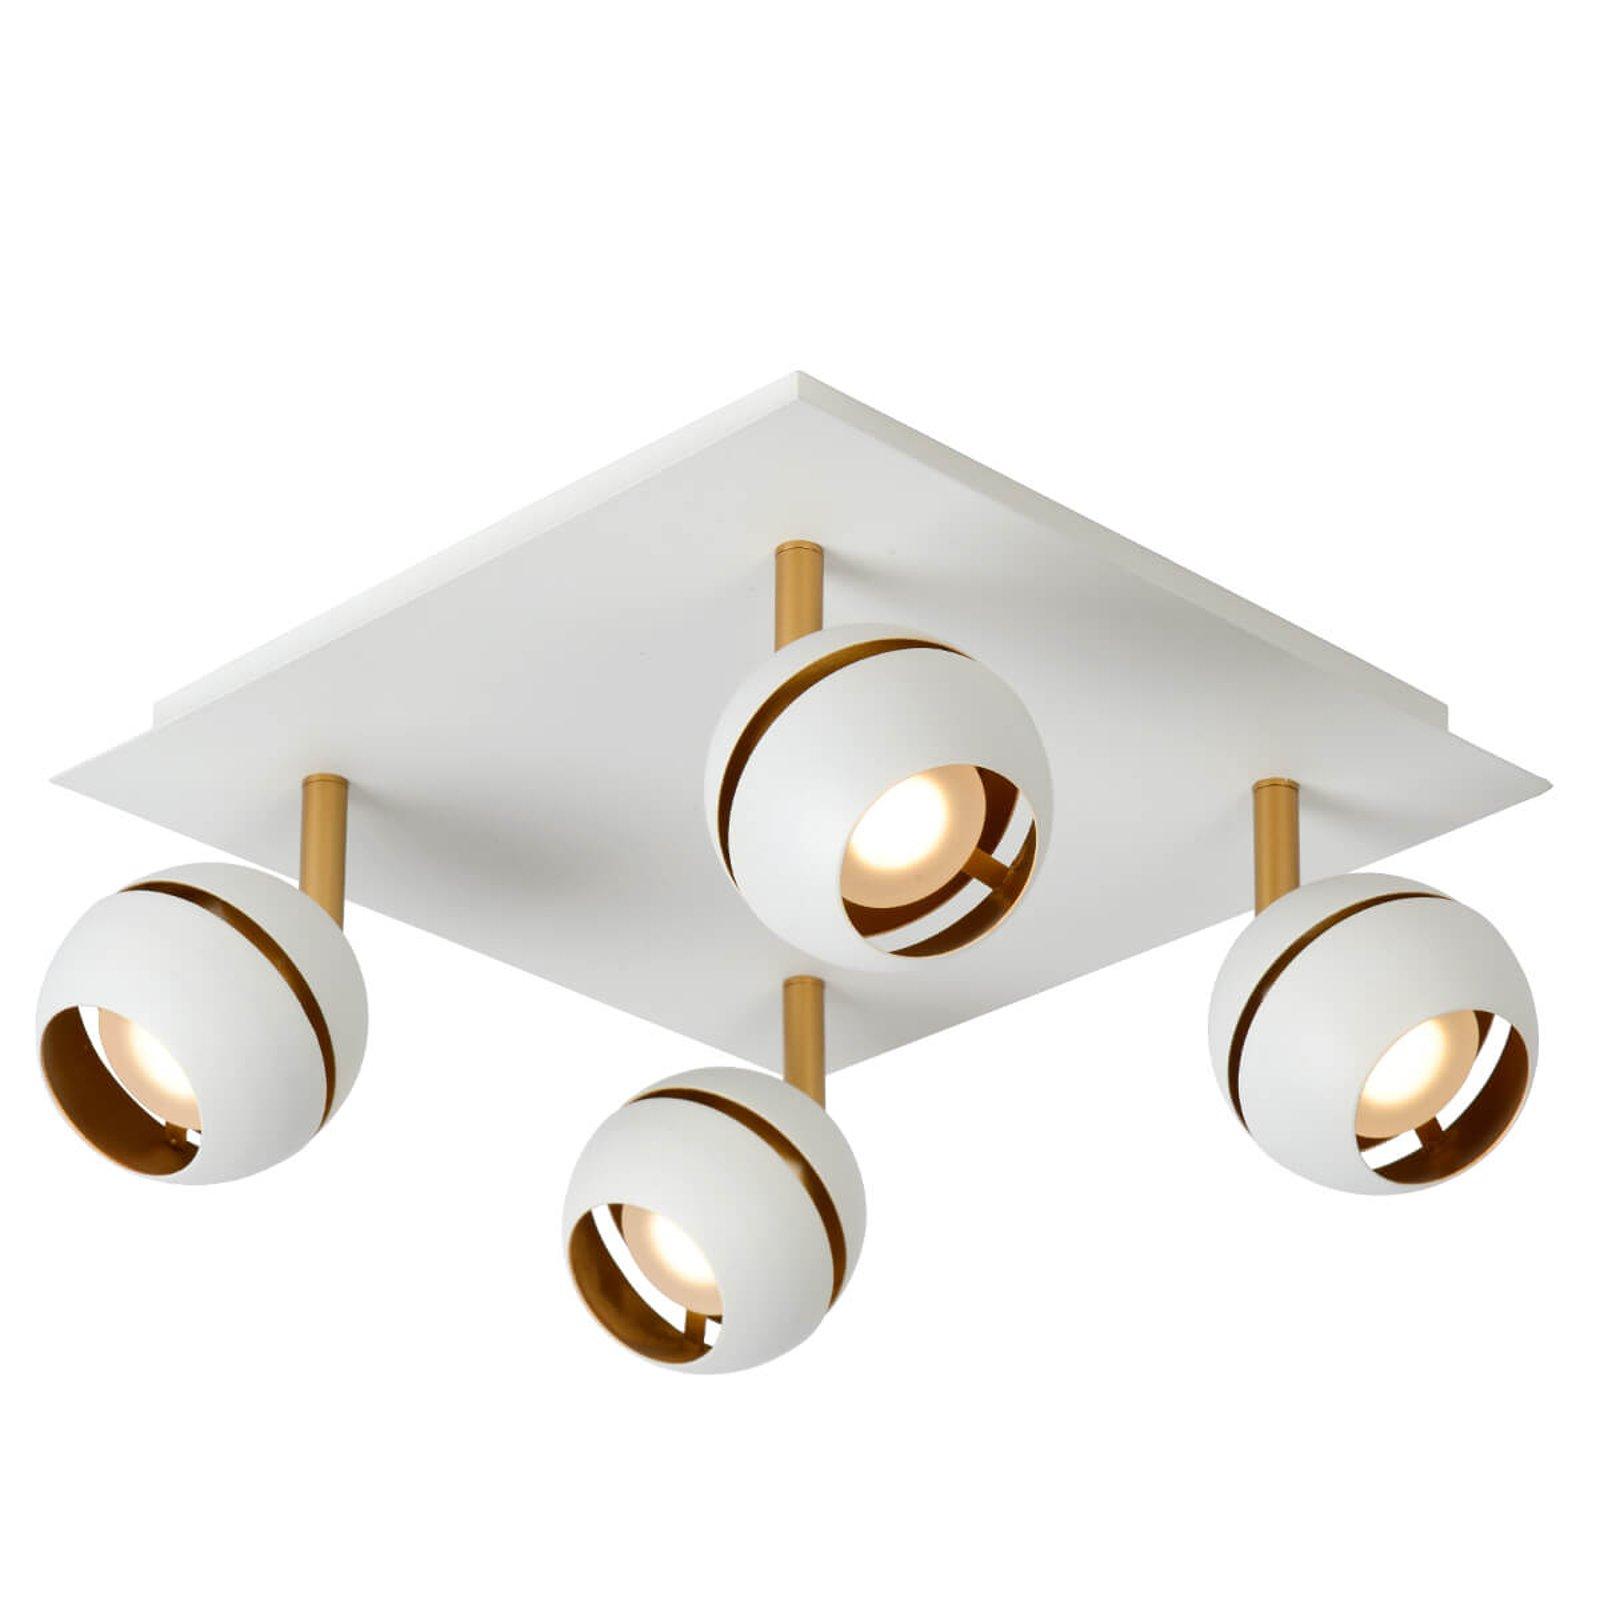 Binari LED-taklampe, 4 lyskilder, hvit